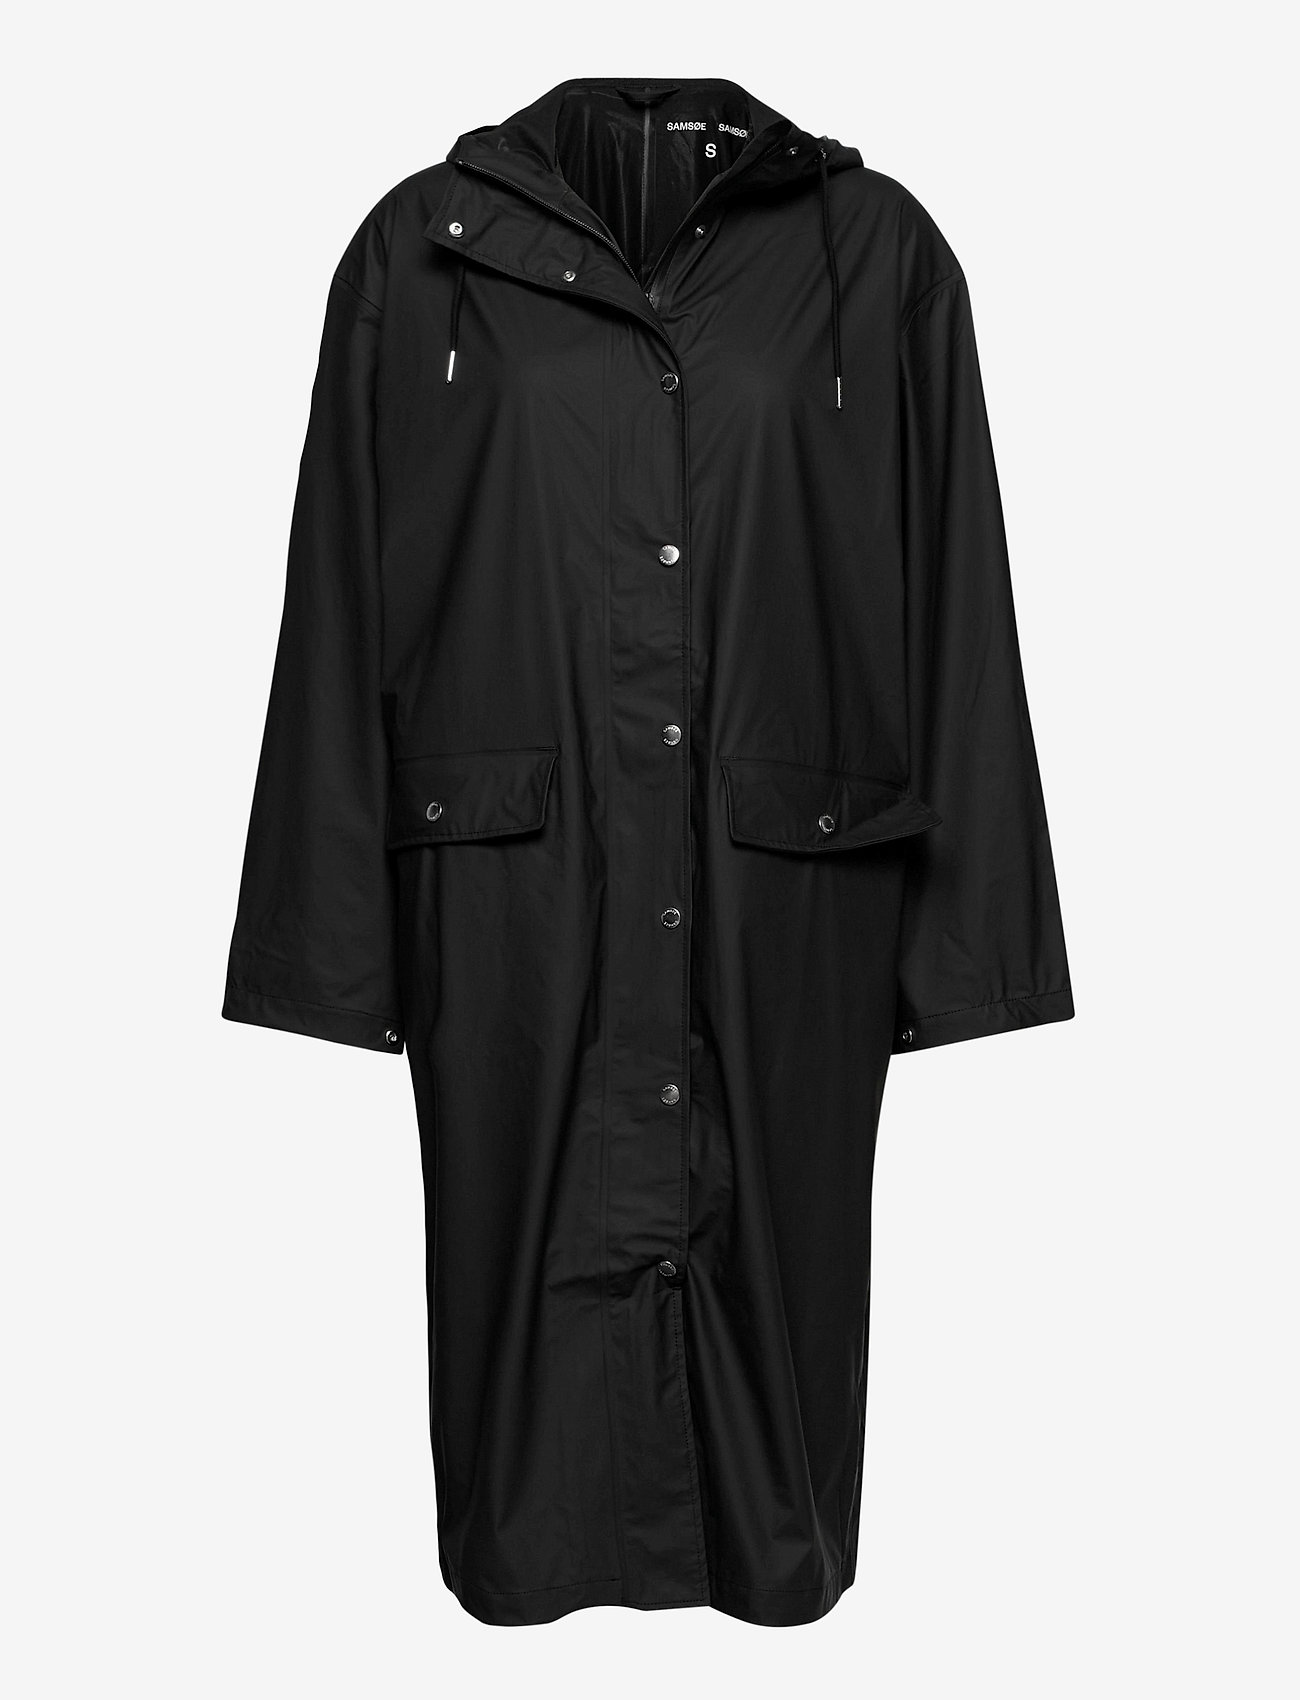 Samsøe Samsøe - Stala long jacket 7357 - manteaux de pluie - black - 0